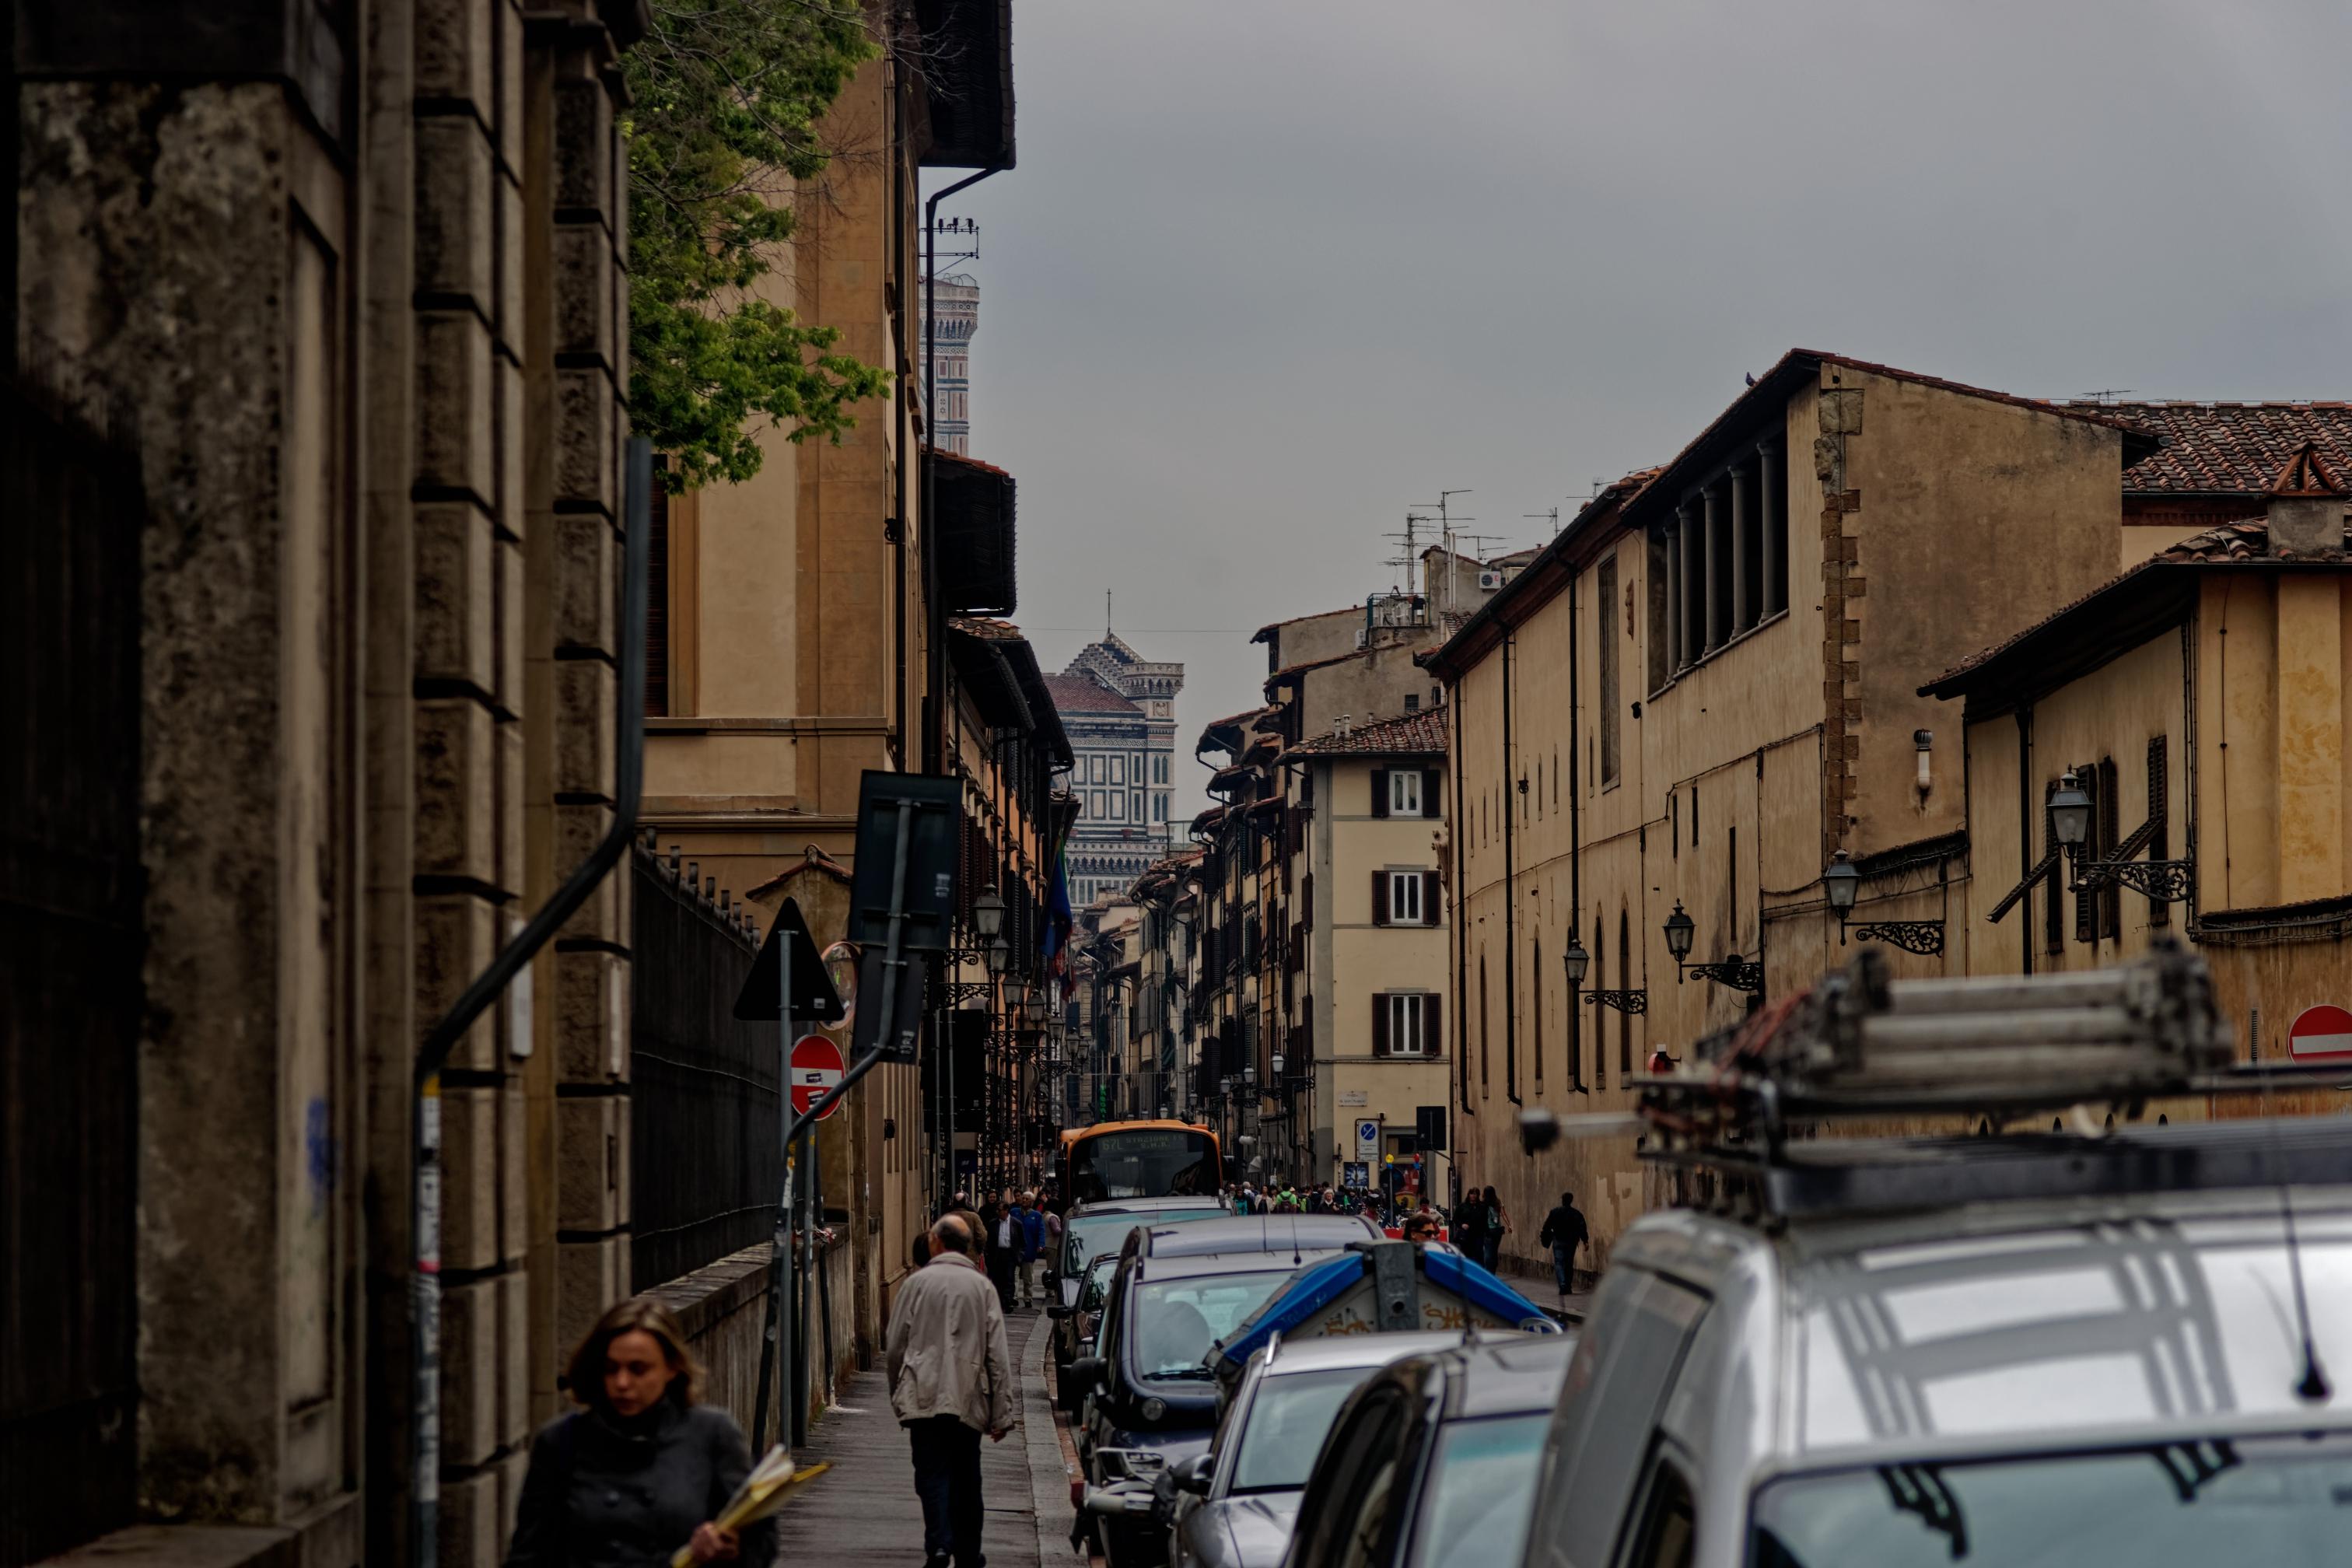 File:firenze florence via giorgio la pira view sw along